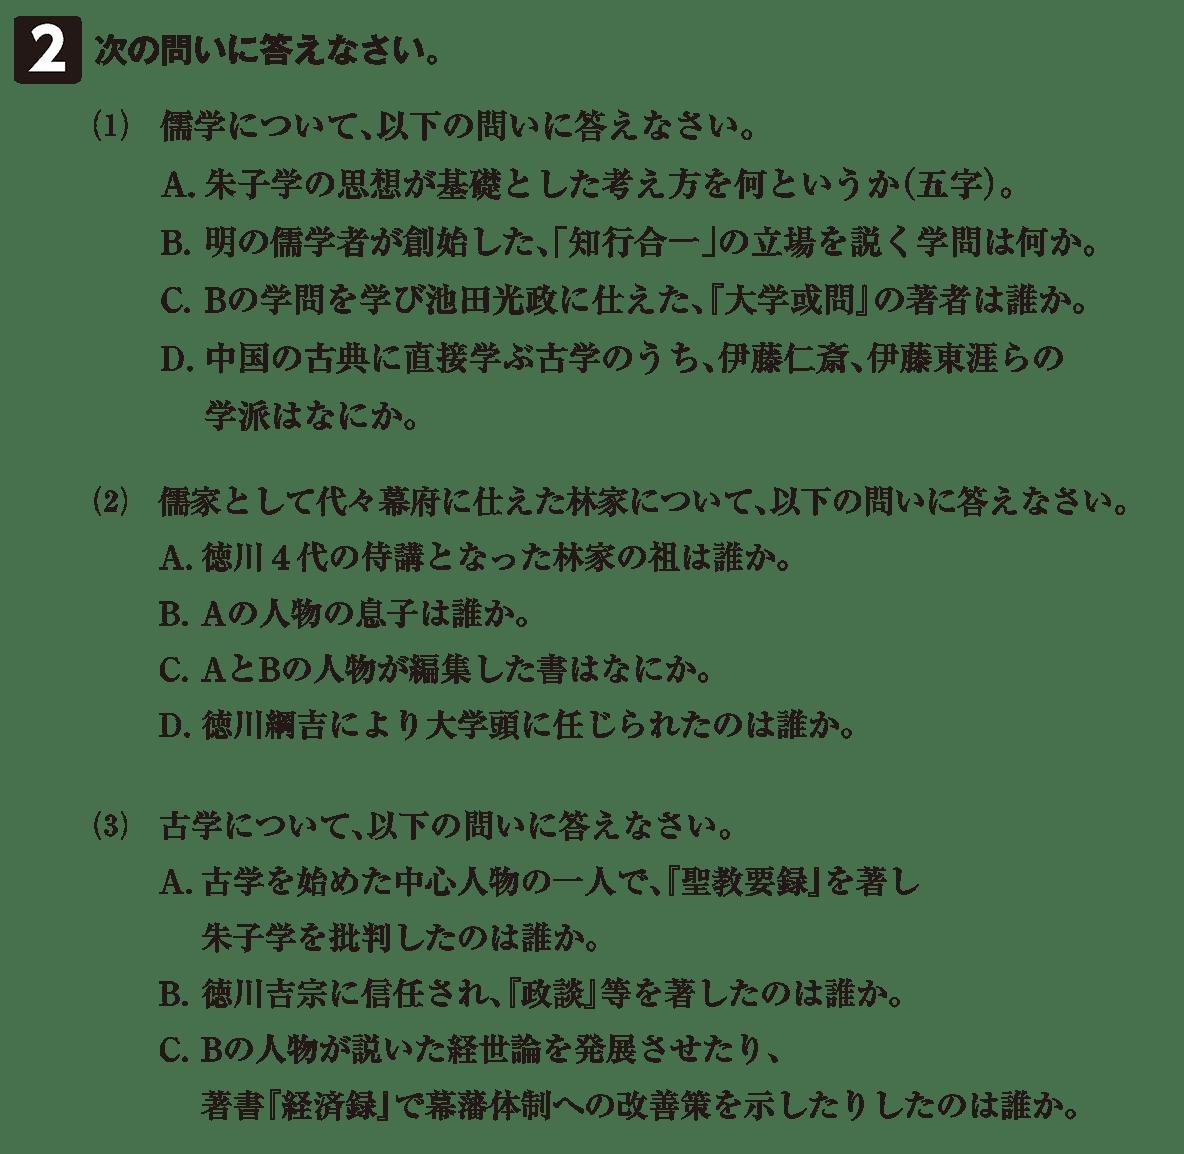 近世の文化21 問題2 問題